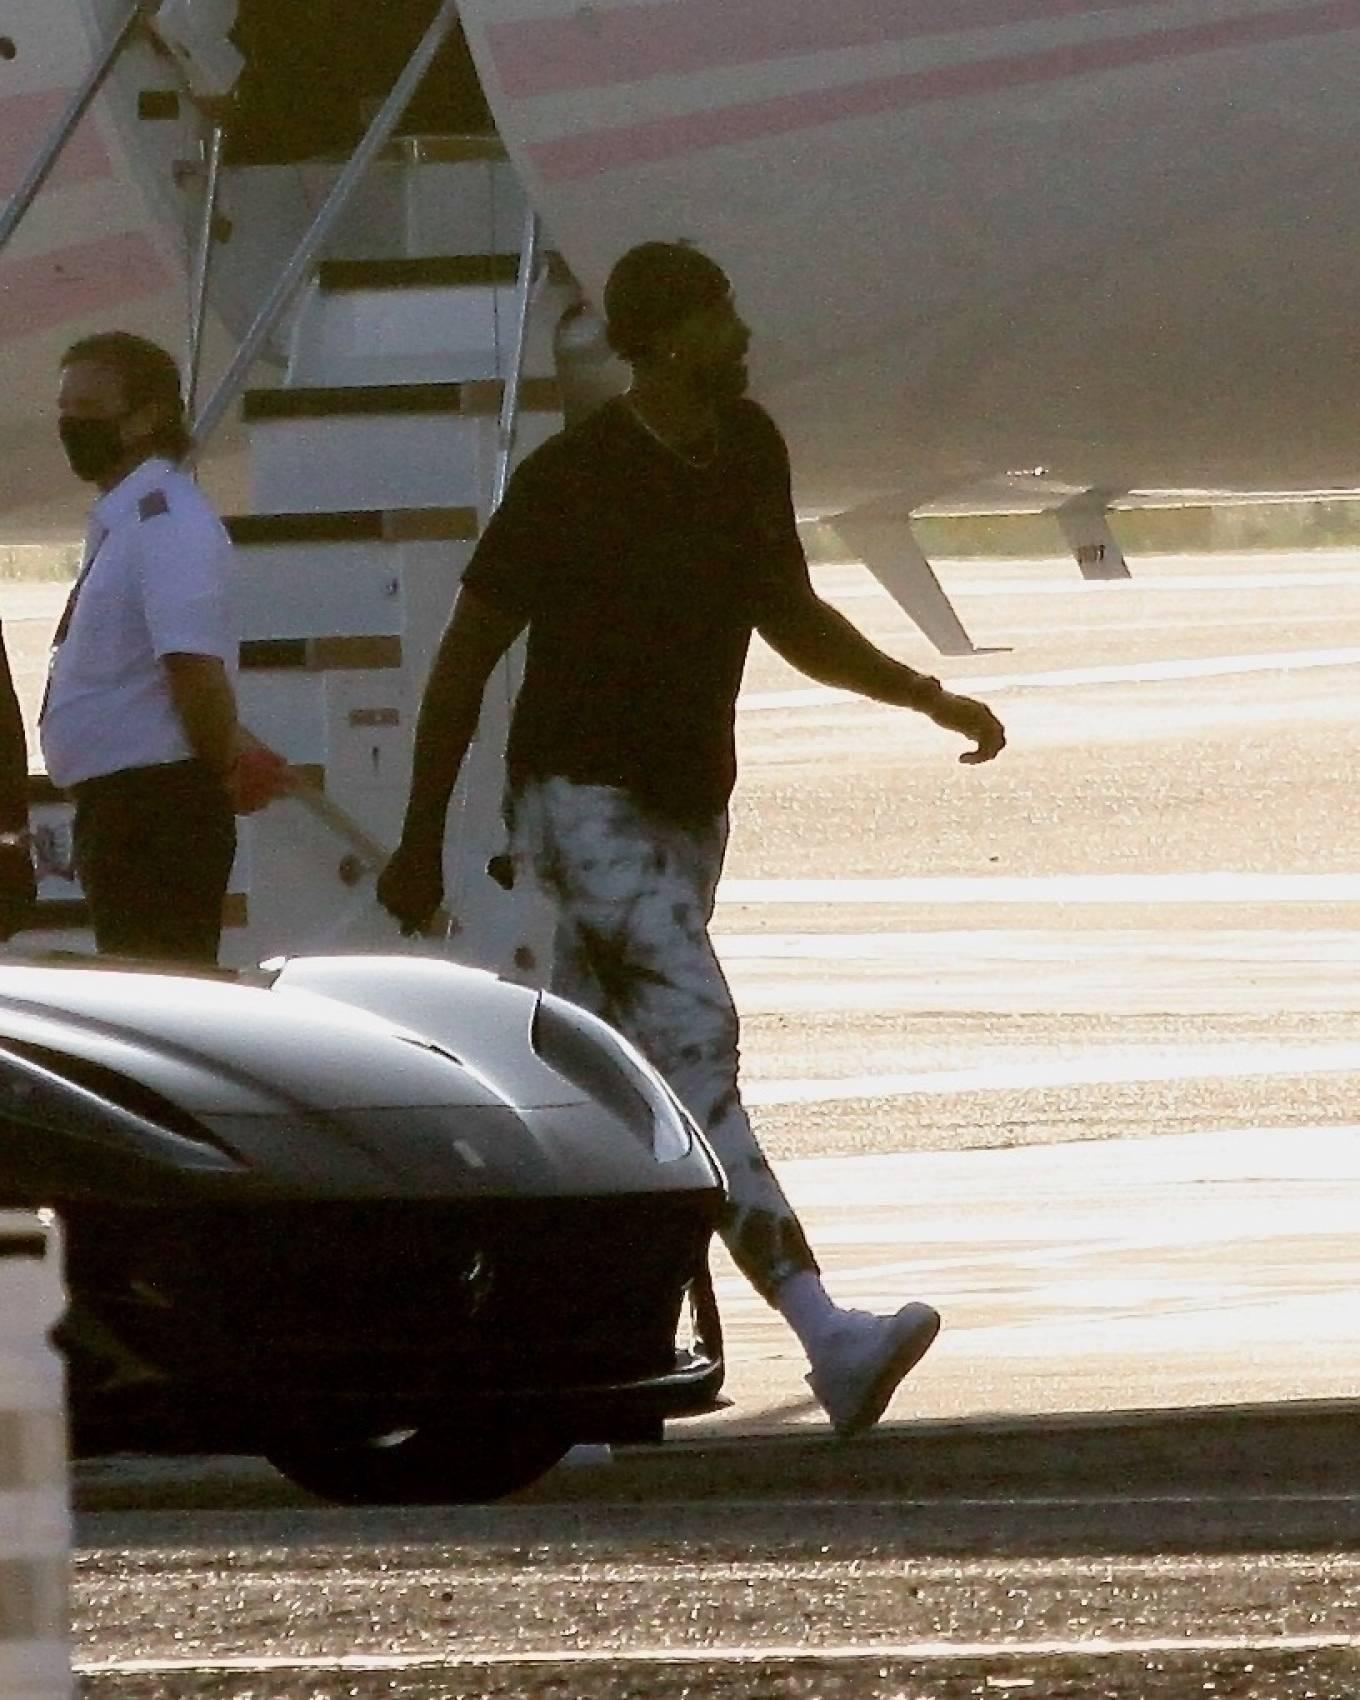 Khloe Kardashian 2020 : Khloe Kardashian and Kourtney Kardashian – Pictured boarding Kylie Jenners private jet in Van Nuys-18